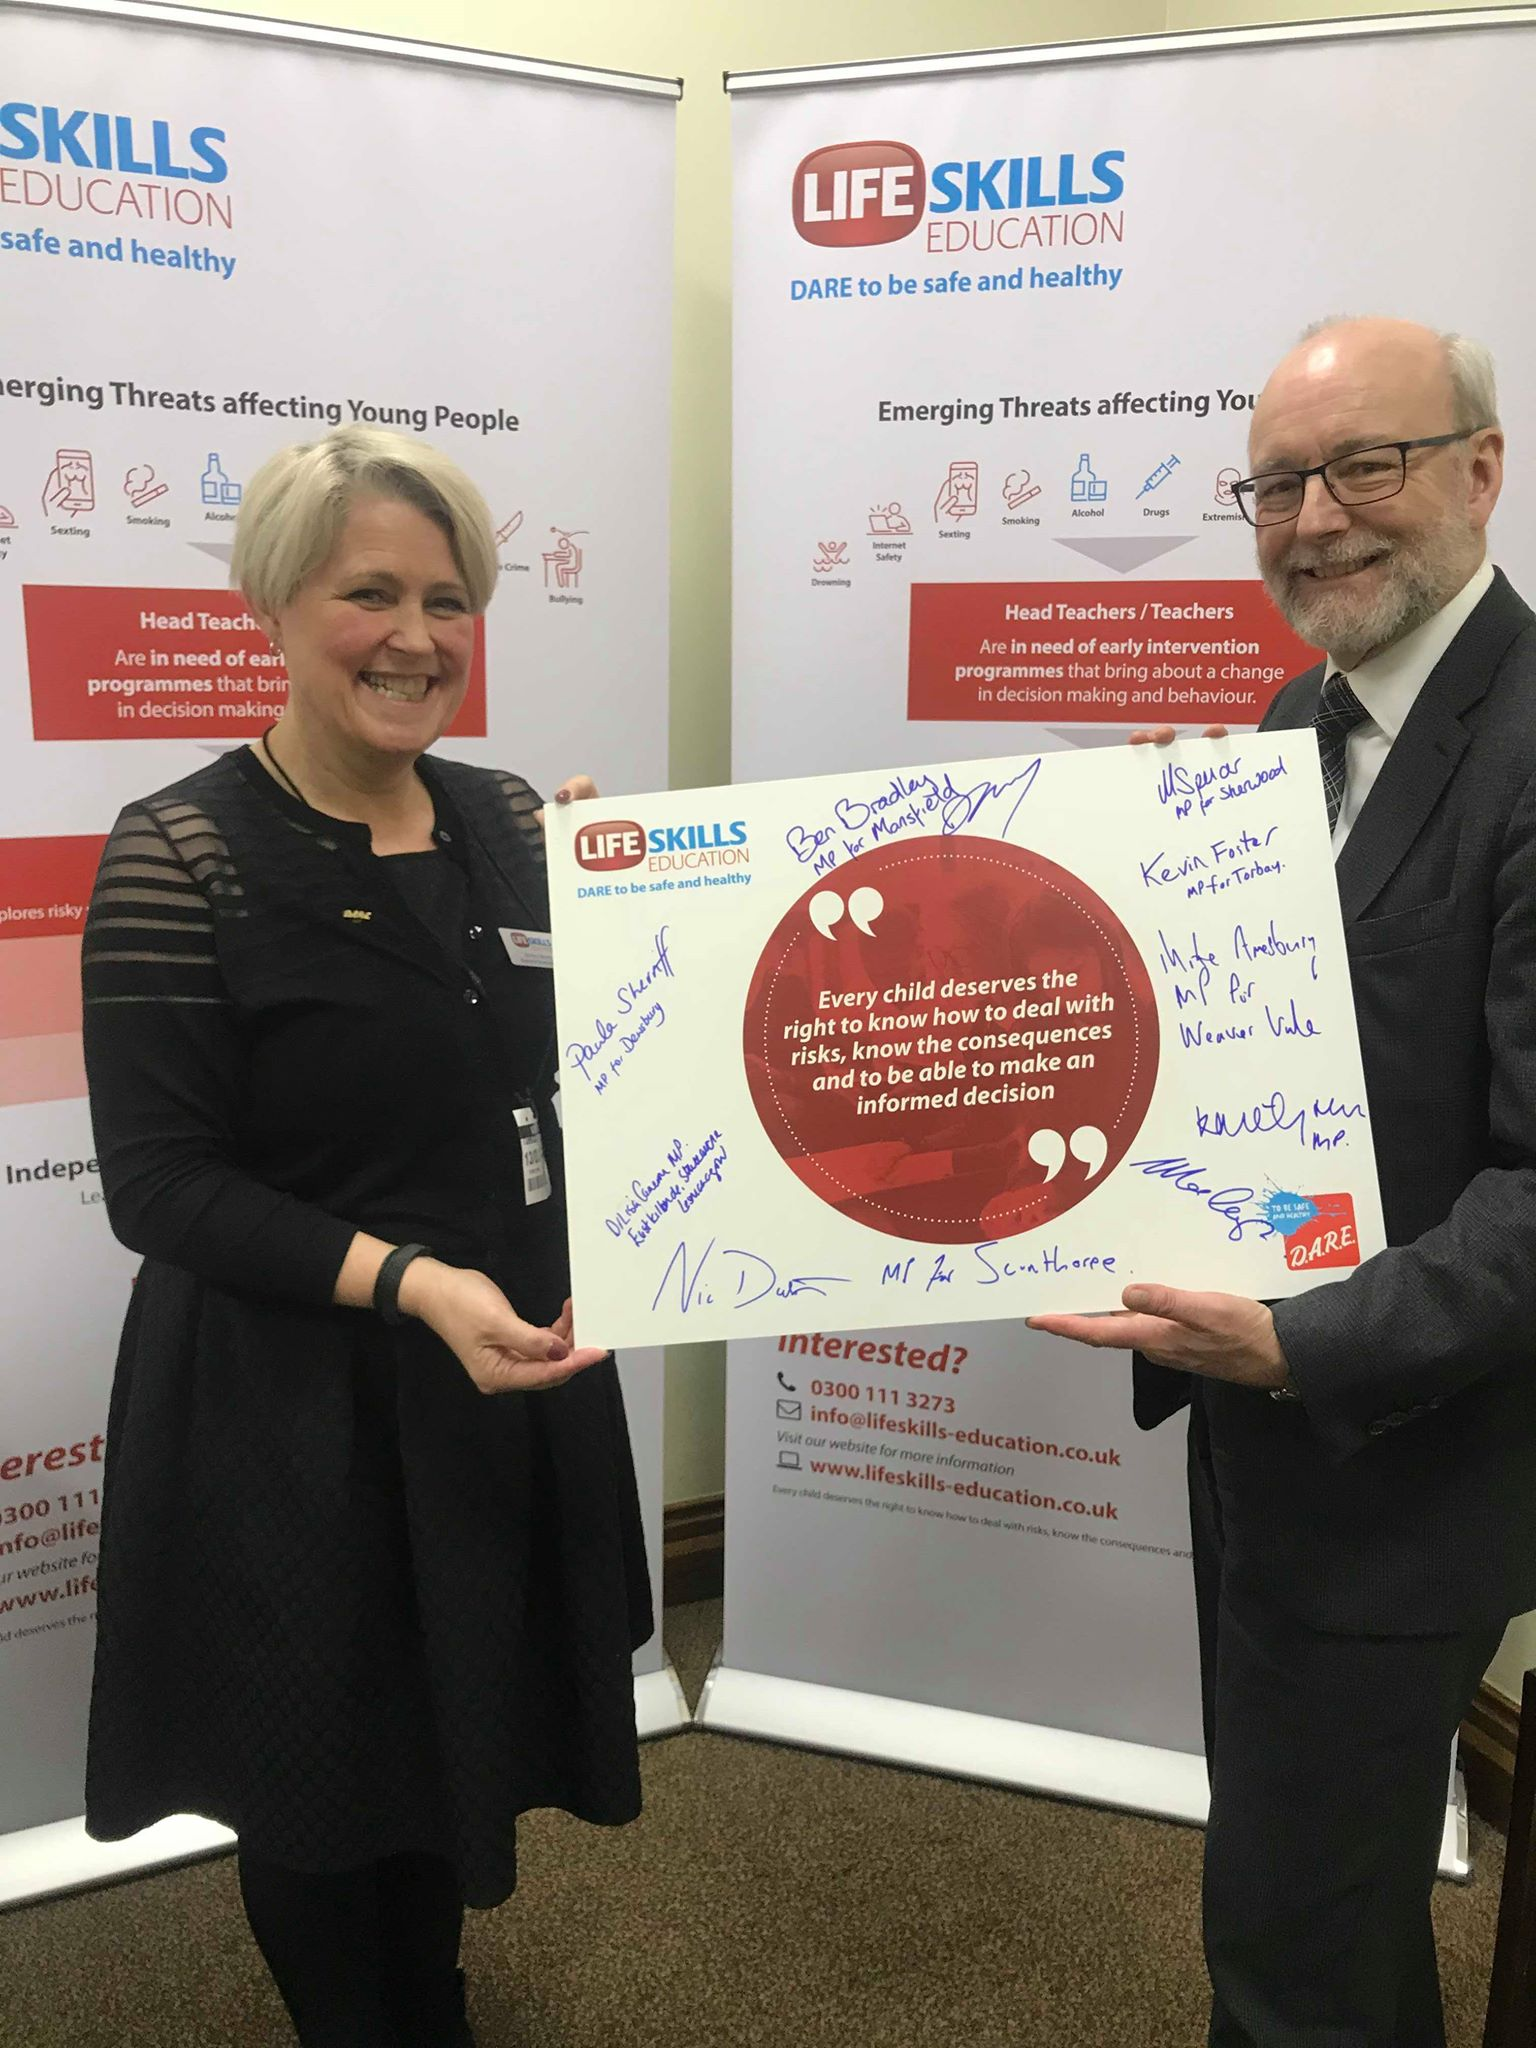 Alex signs Life Skills Education pledge